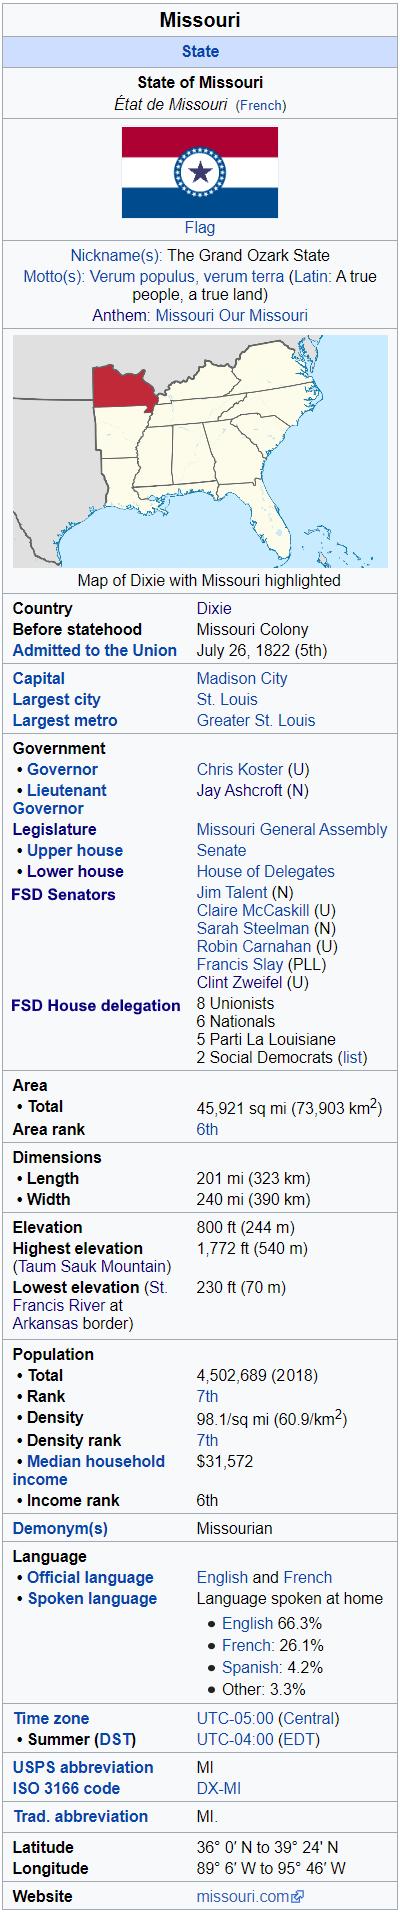 Missouri Wiki.png